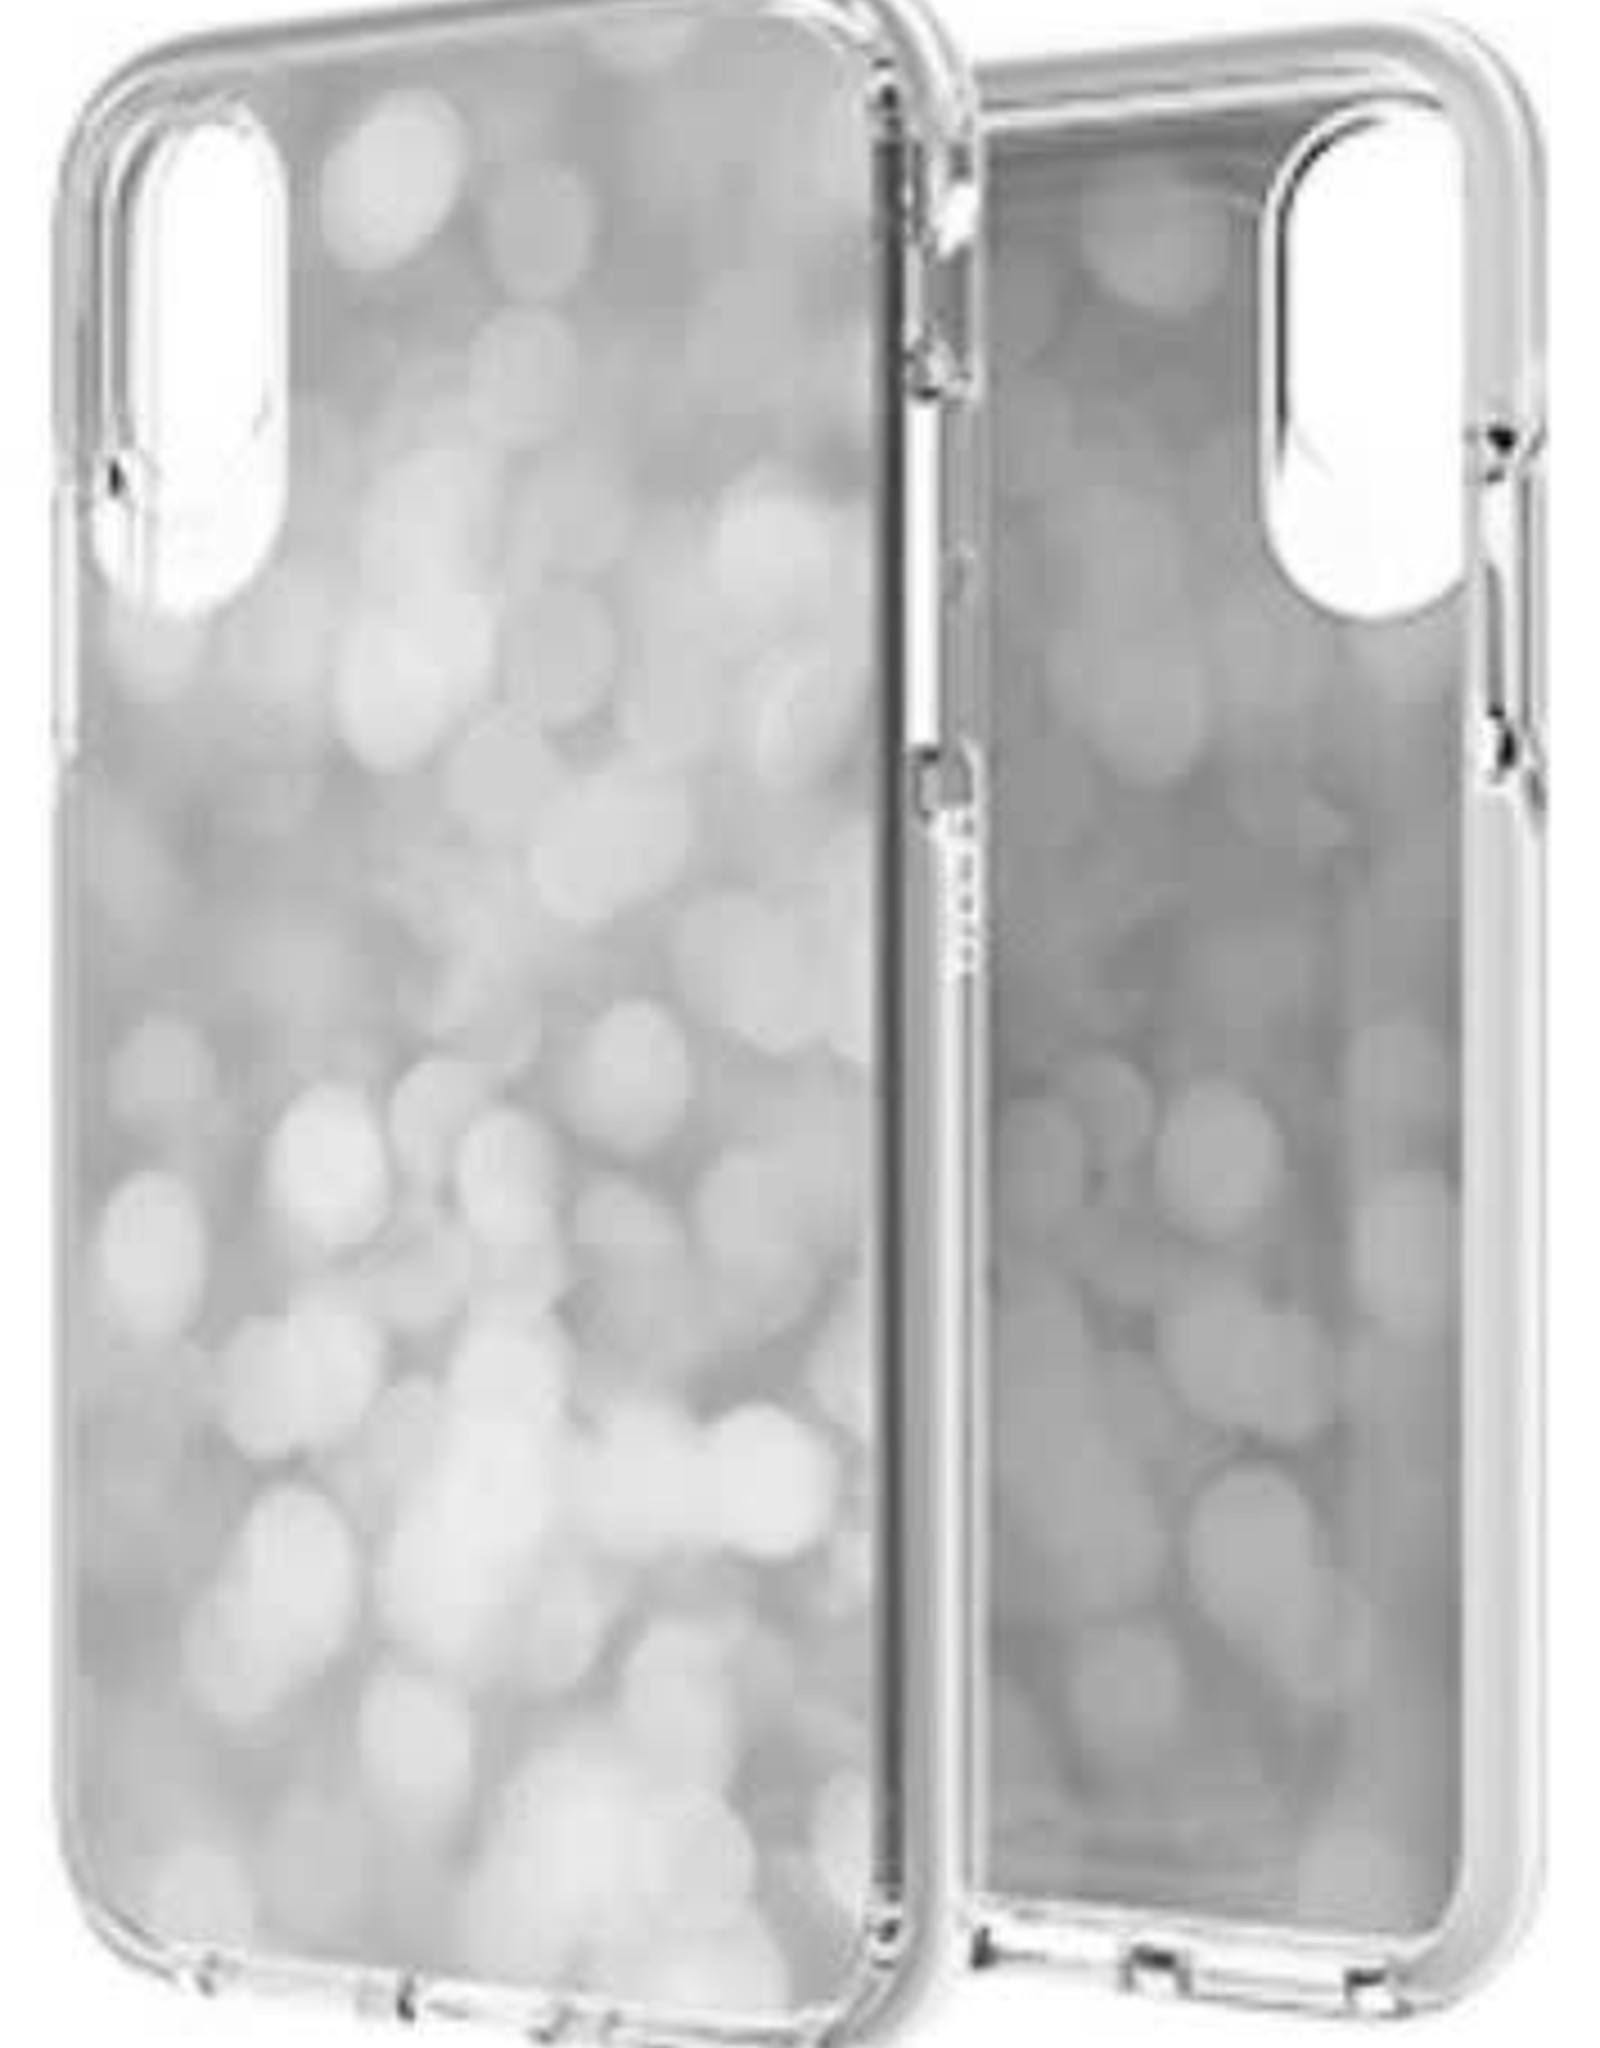 GEAR4 GEAR4 | iPhone X D3O Dazzle Victoria case | 15-02416